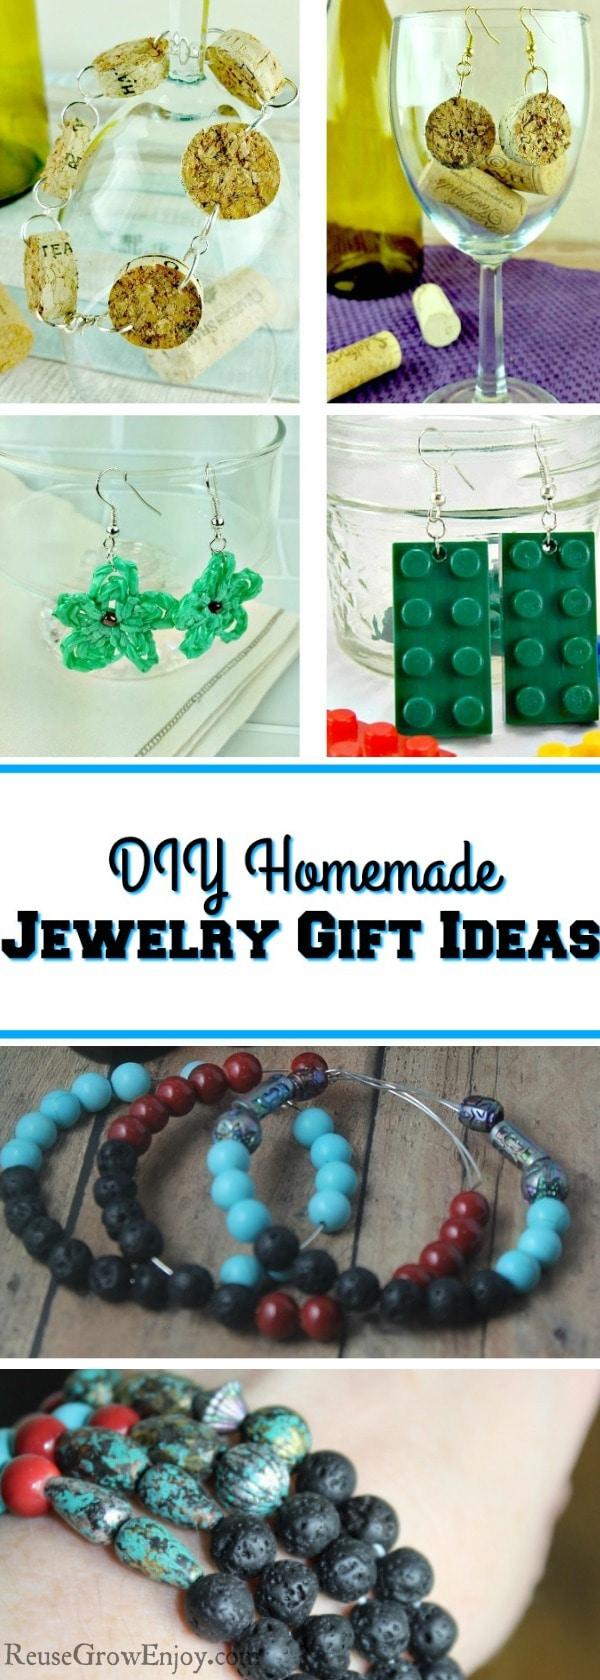 DIY Jewelry Gift Ideas All Homemade Reuse Grow Enjoy